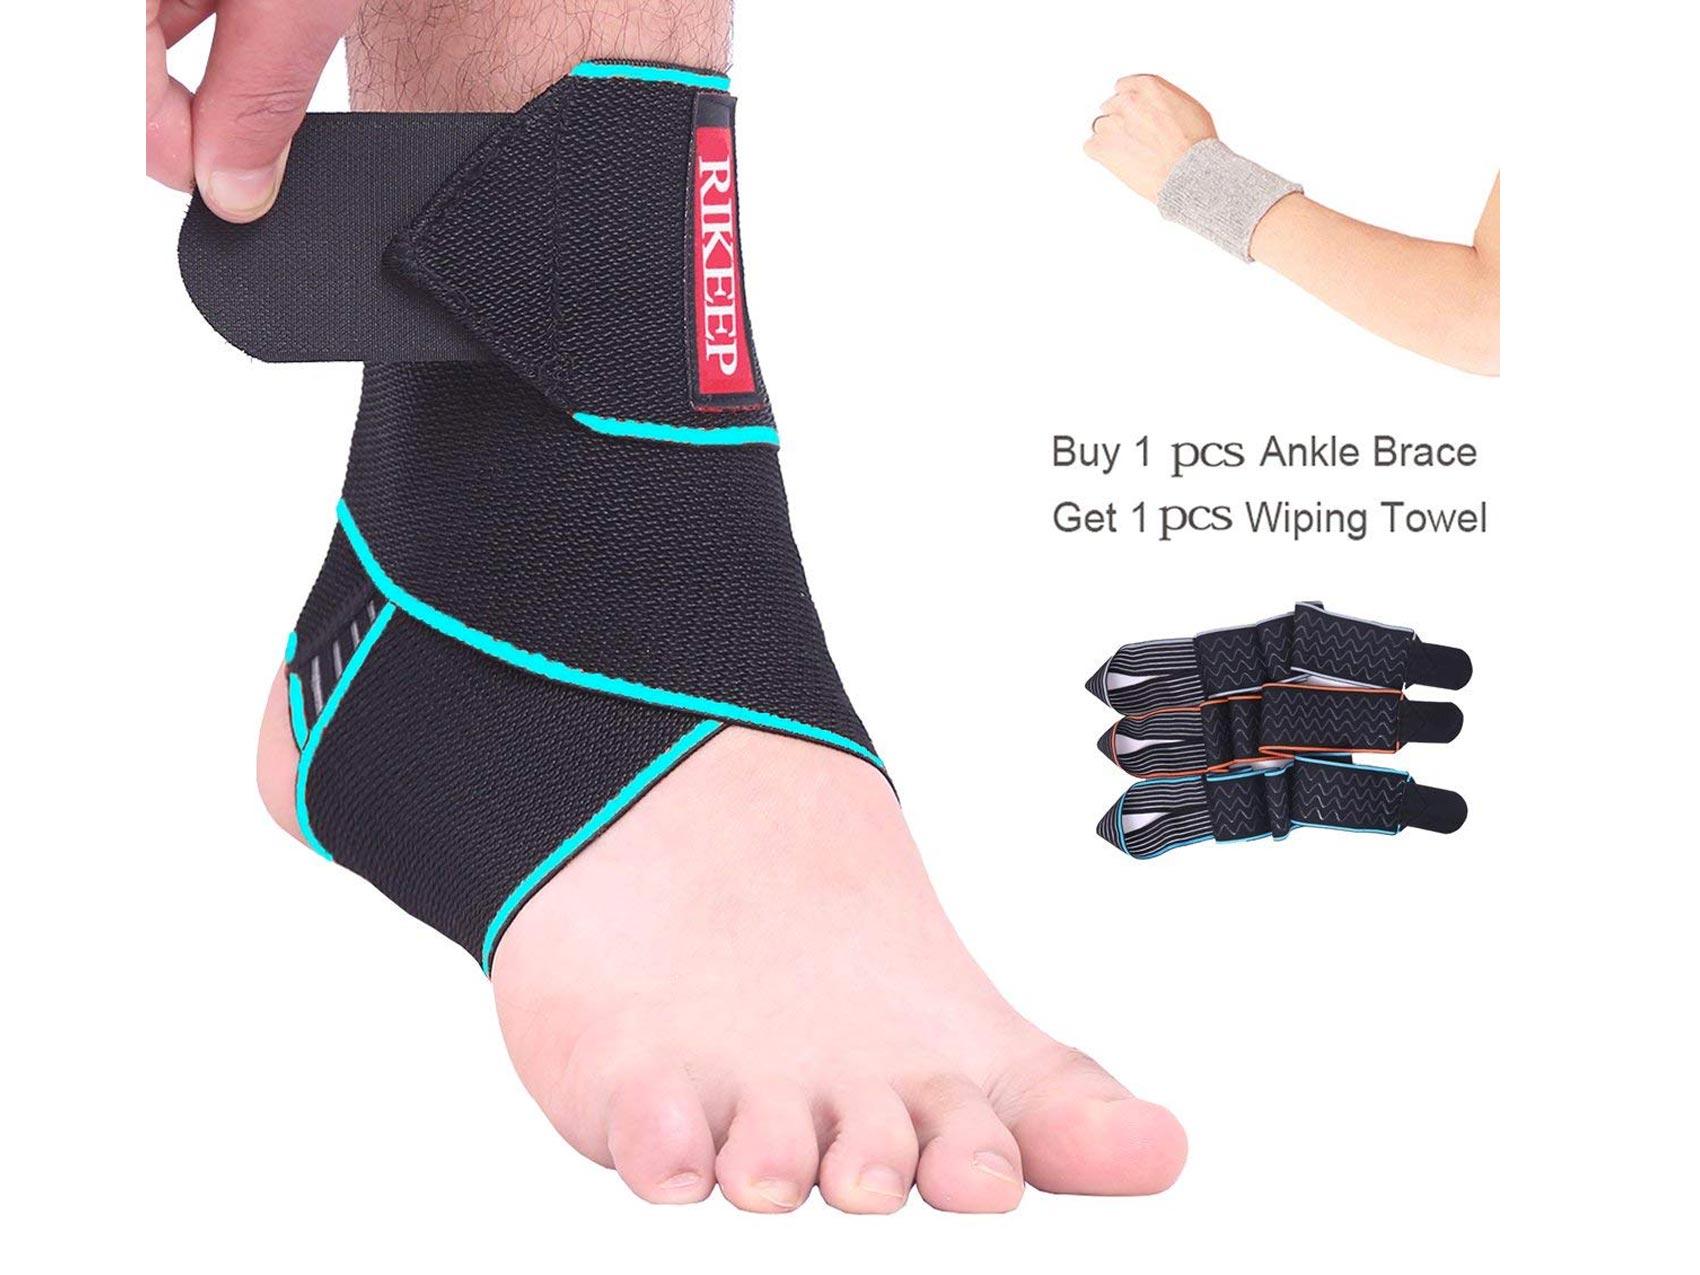 Rikeep ankle brace